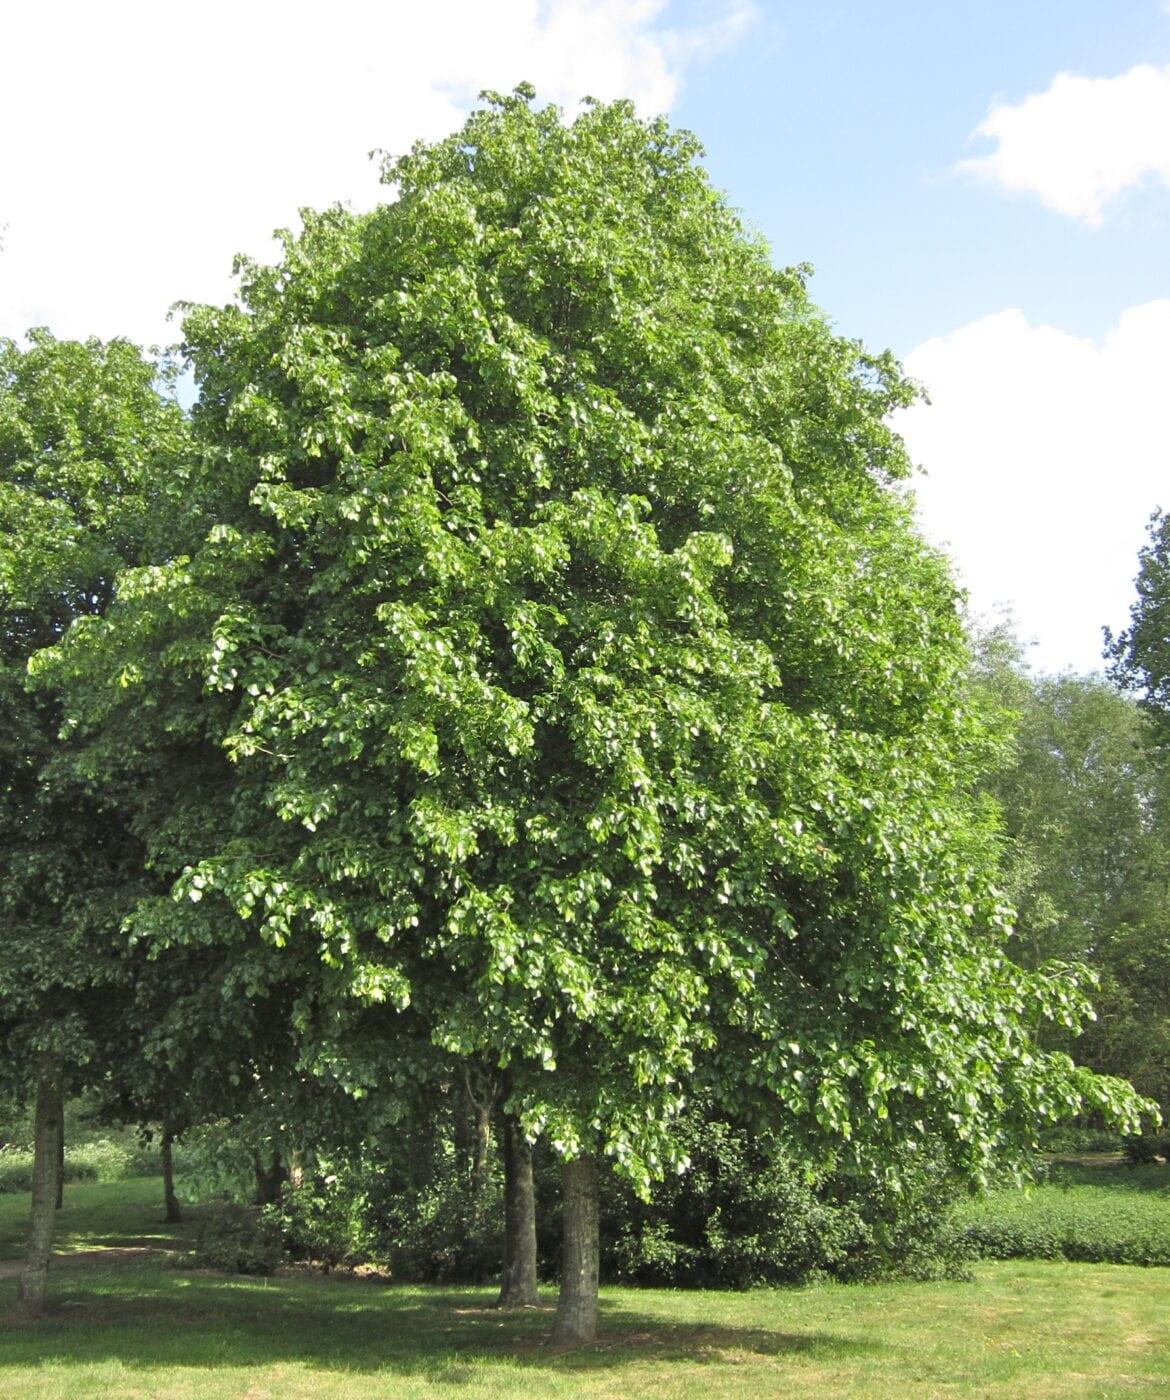 Crimean Lime trees